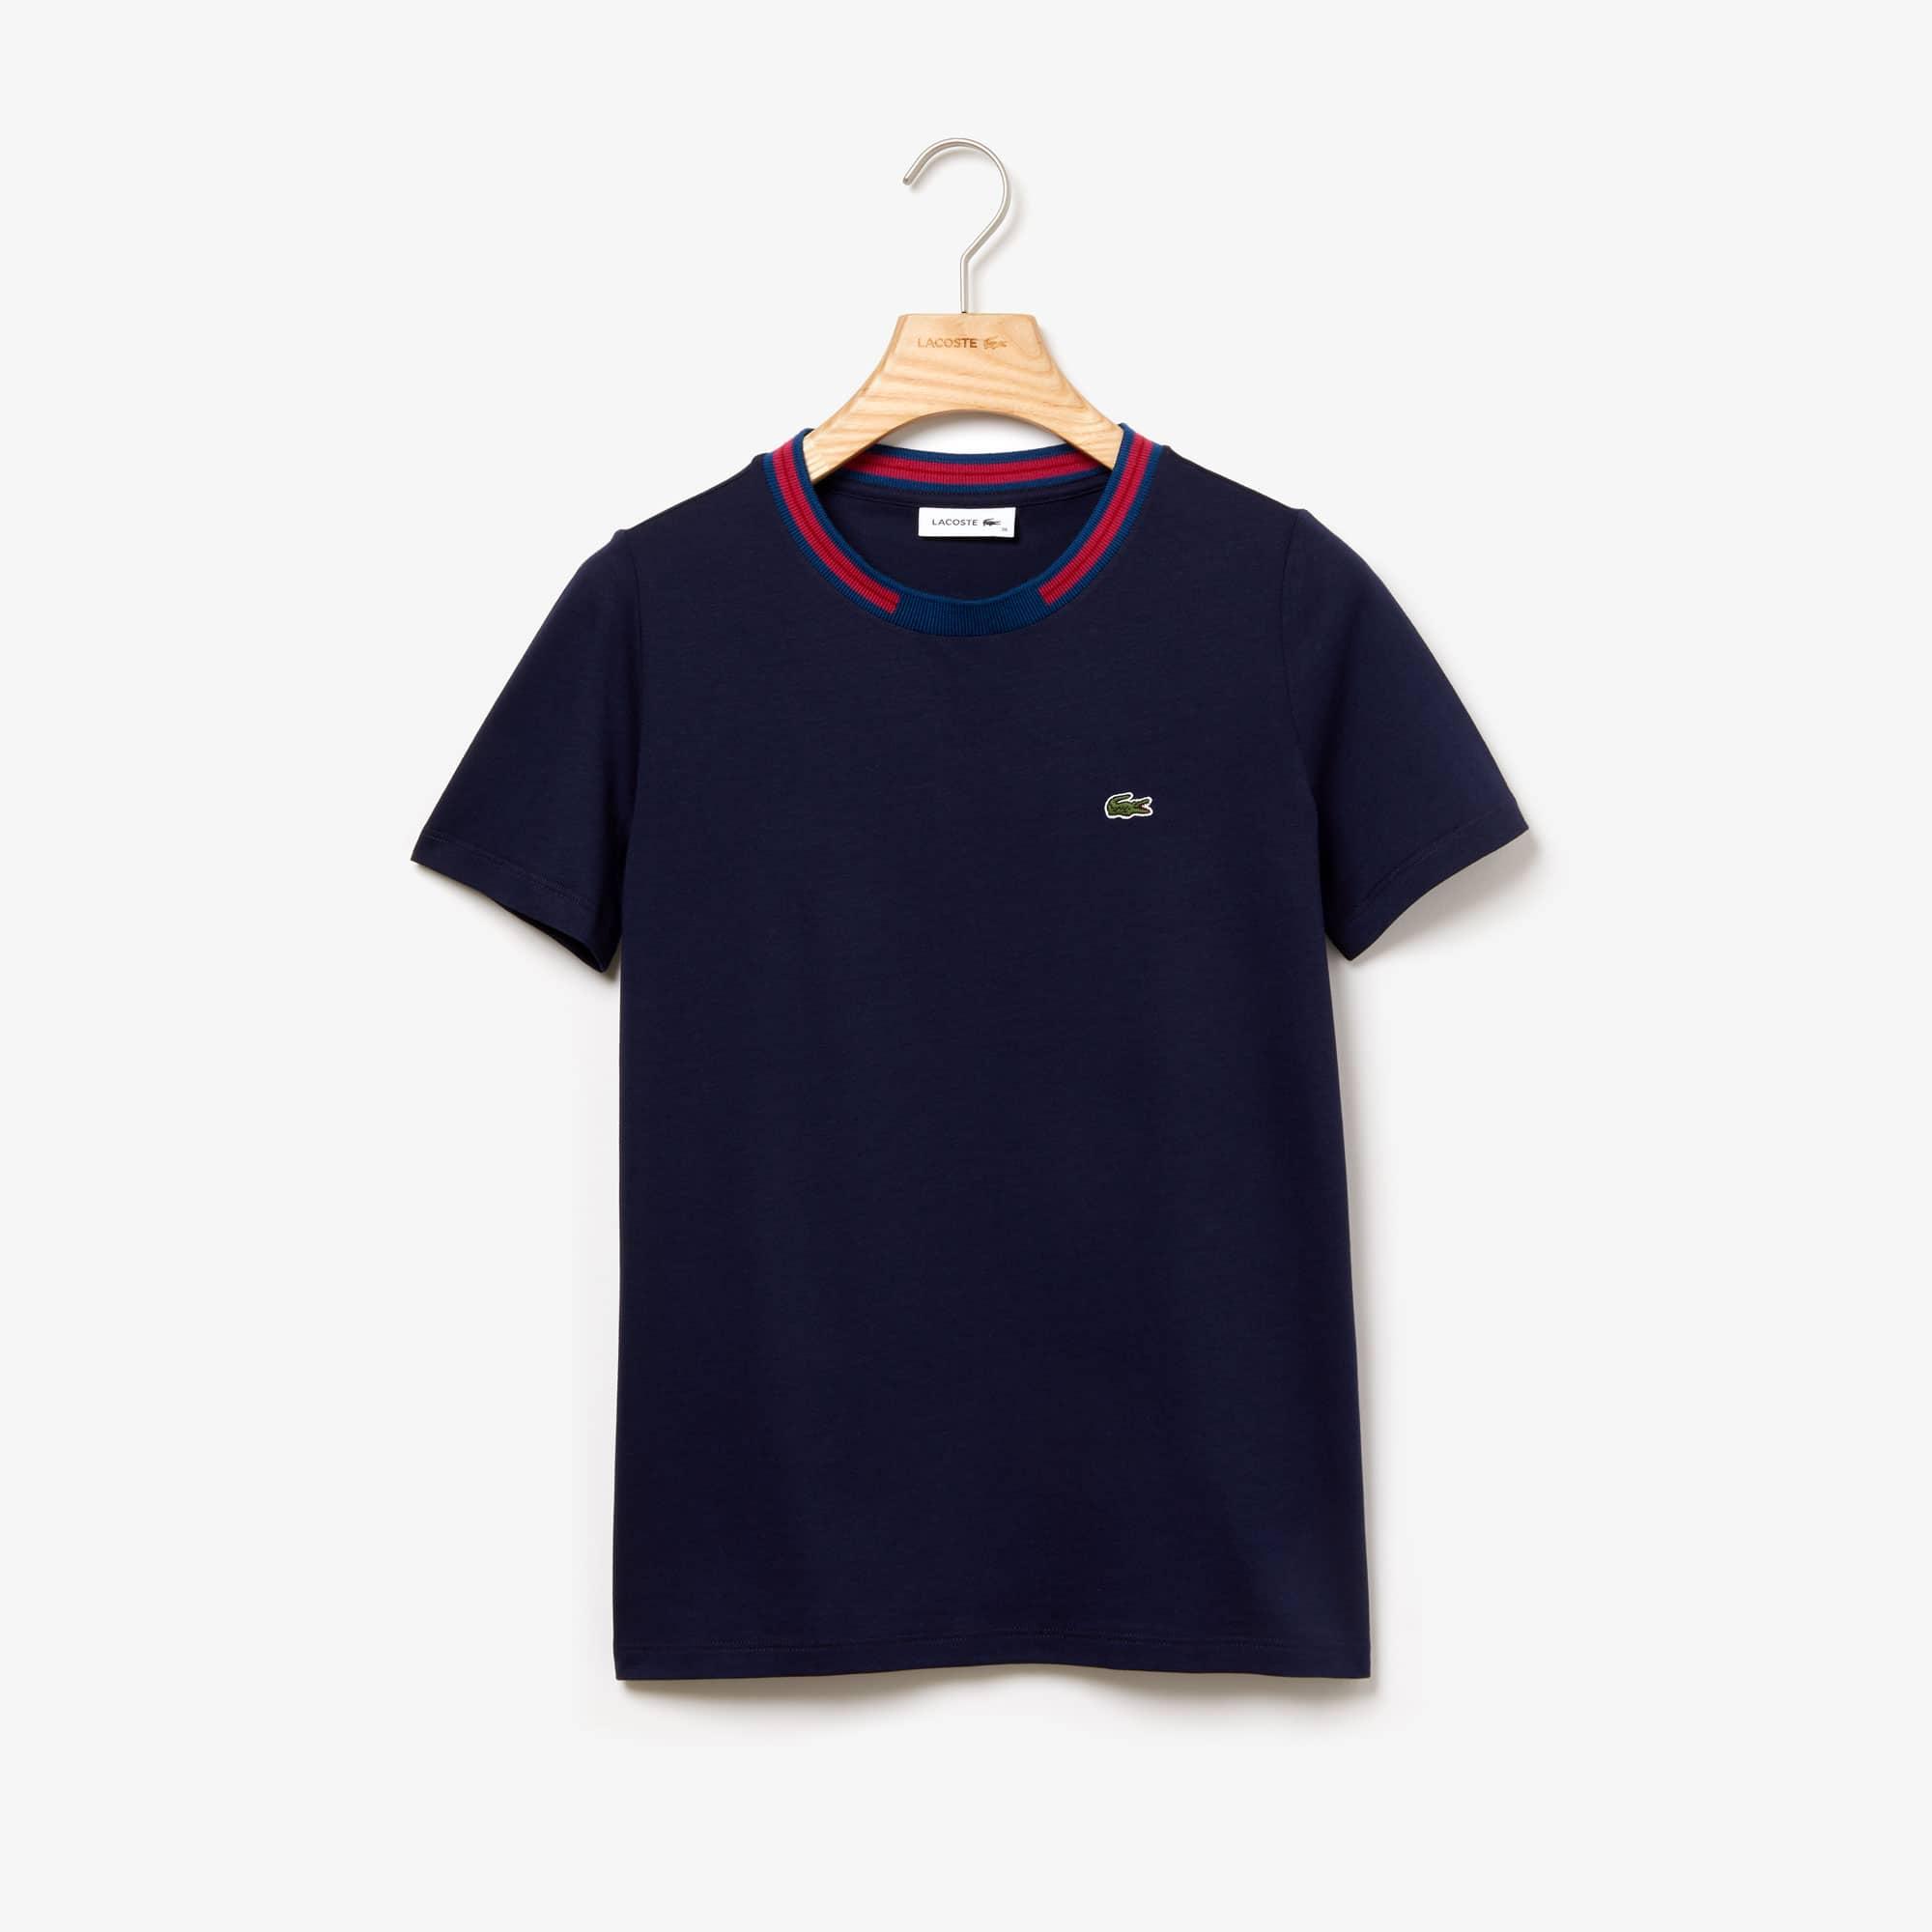 6086cbe915 Women's T Shirts   Lacoste T Shirts for Women   LACOSTE